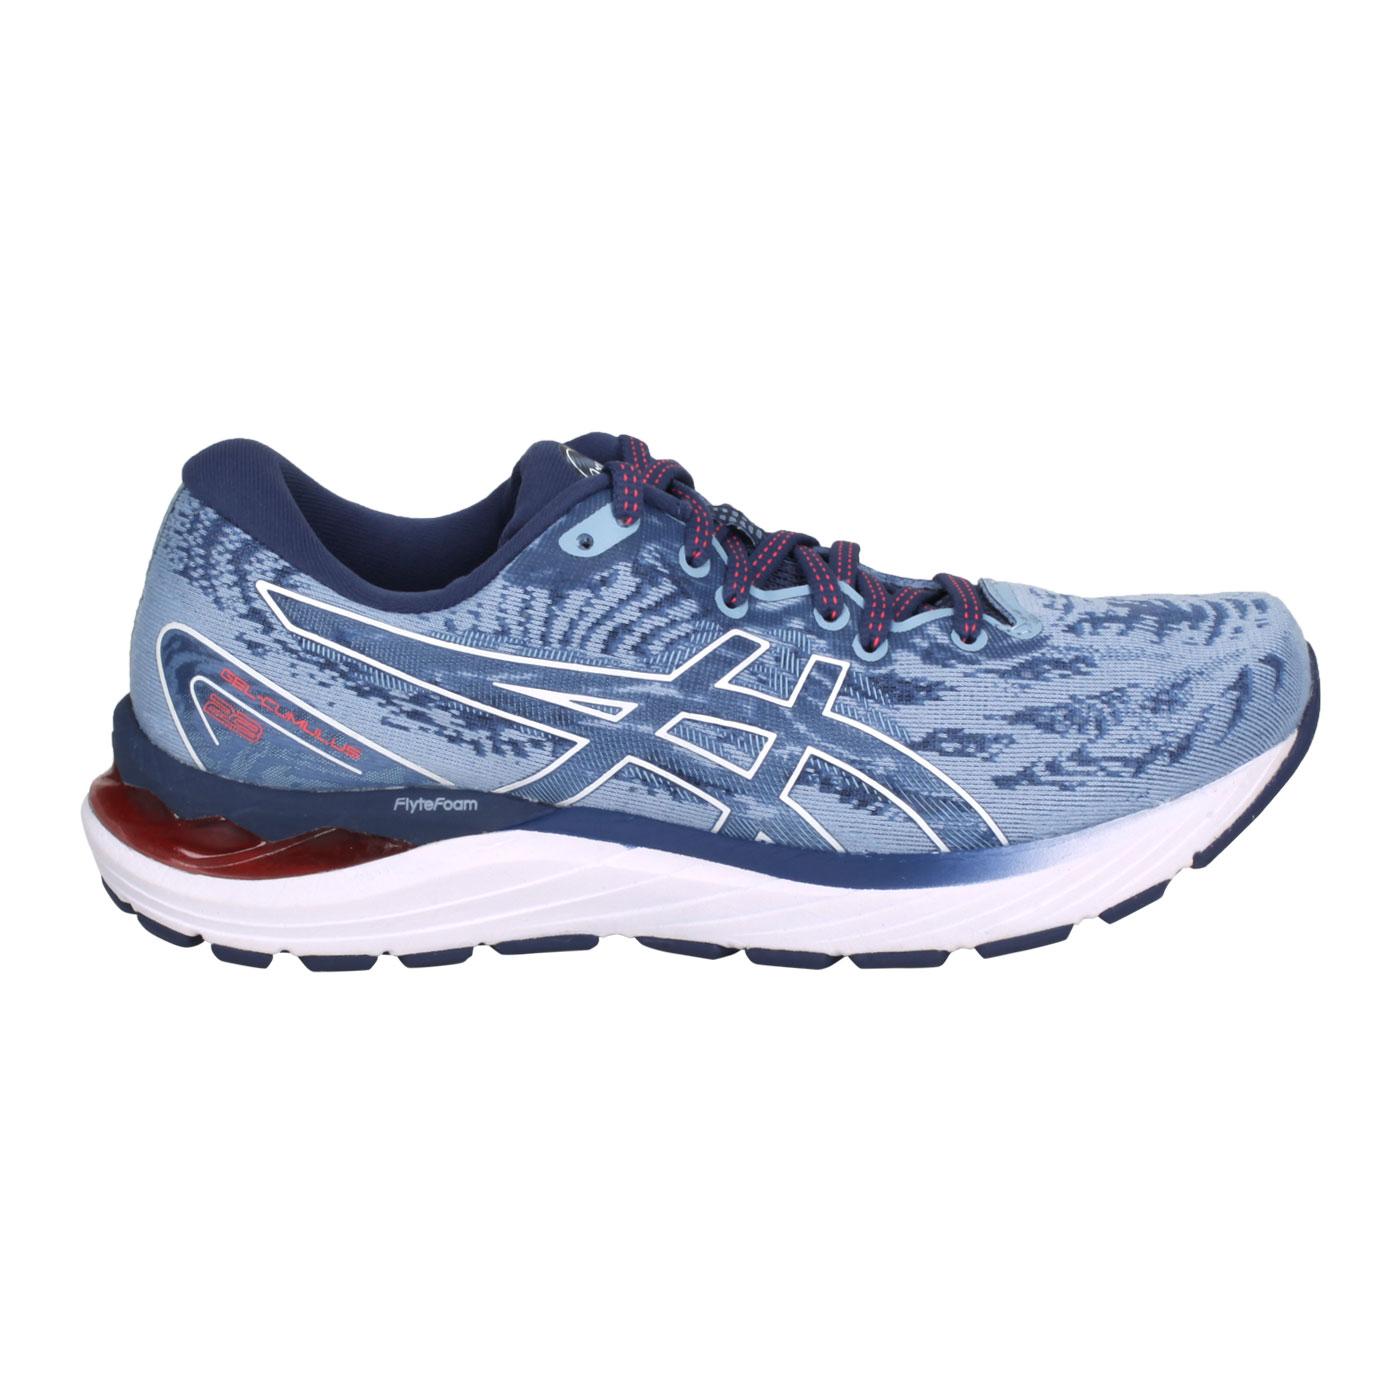 ASICS 女款慢跑鞋   @GEL-CUMULUS 23@1012A888-417